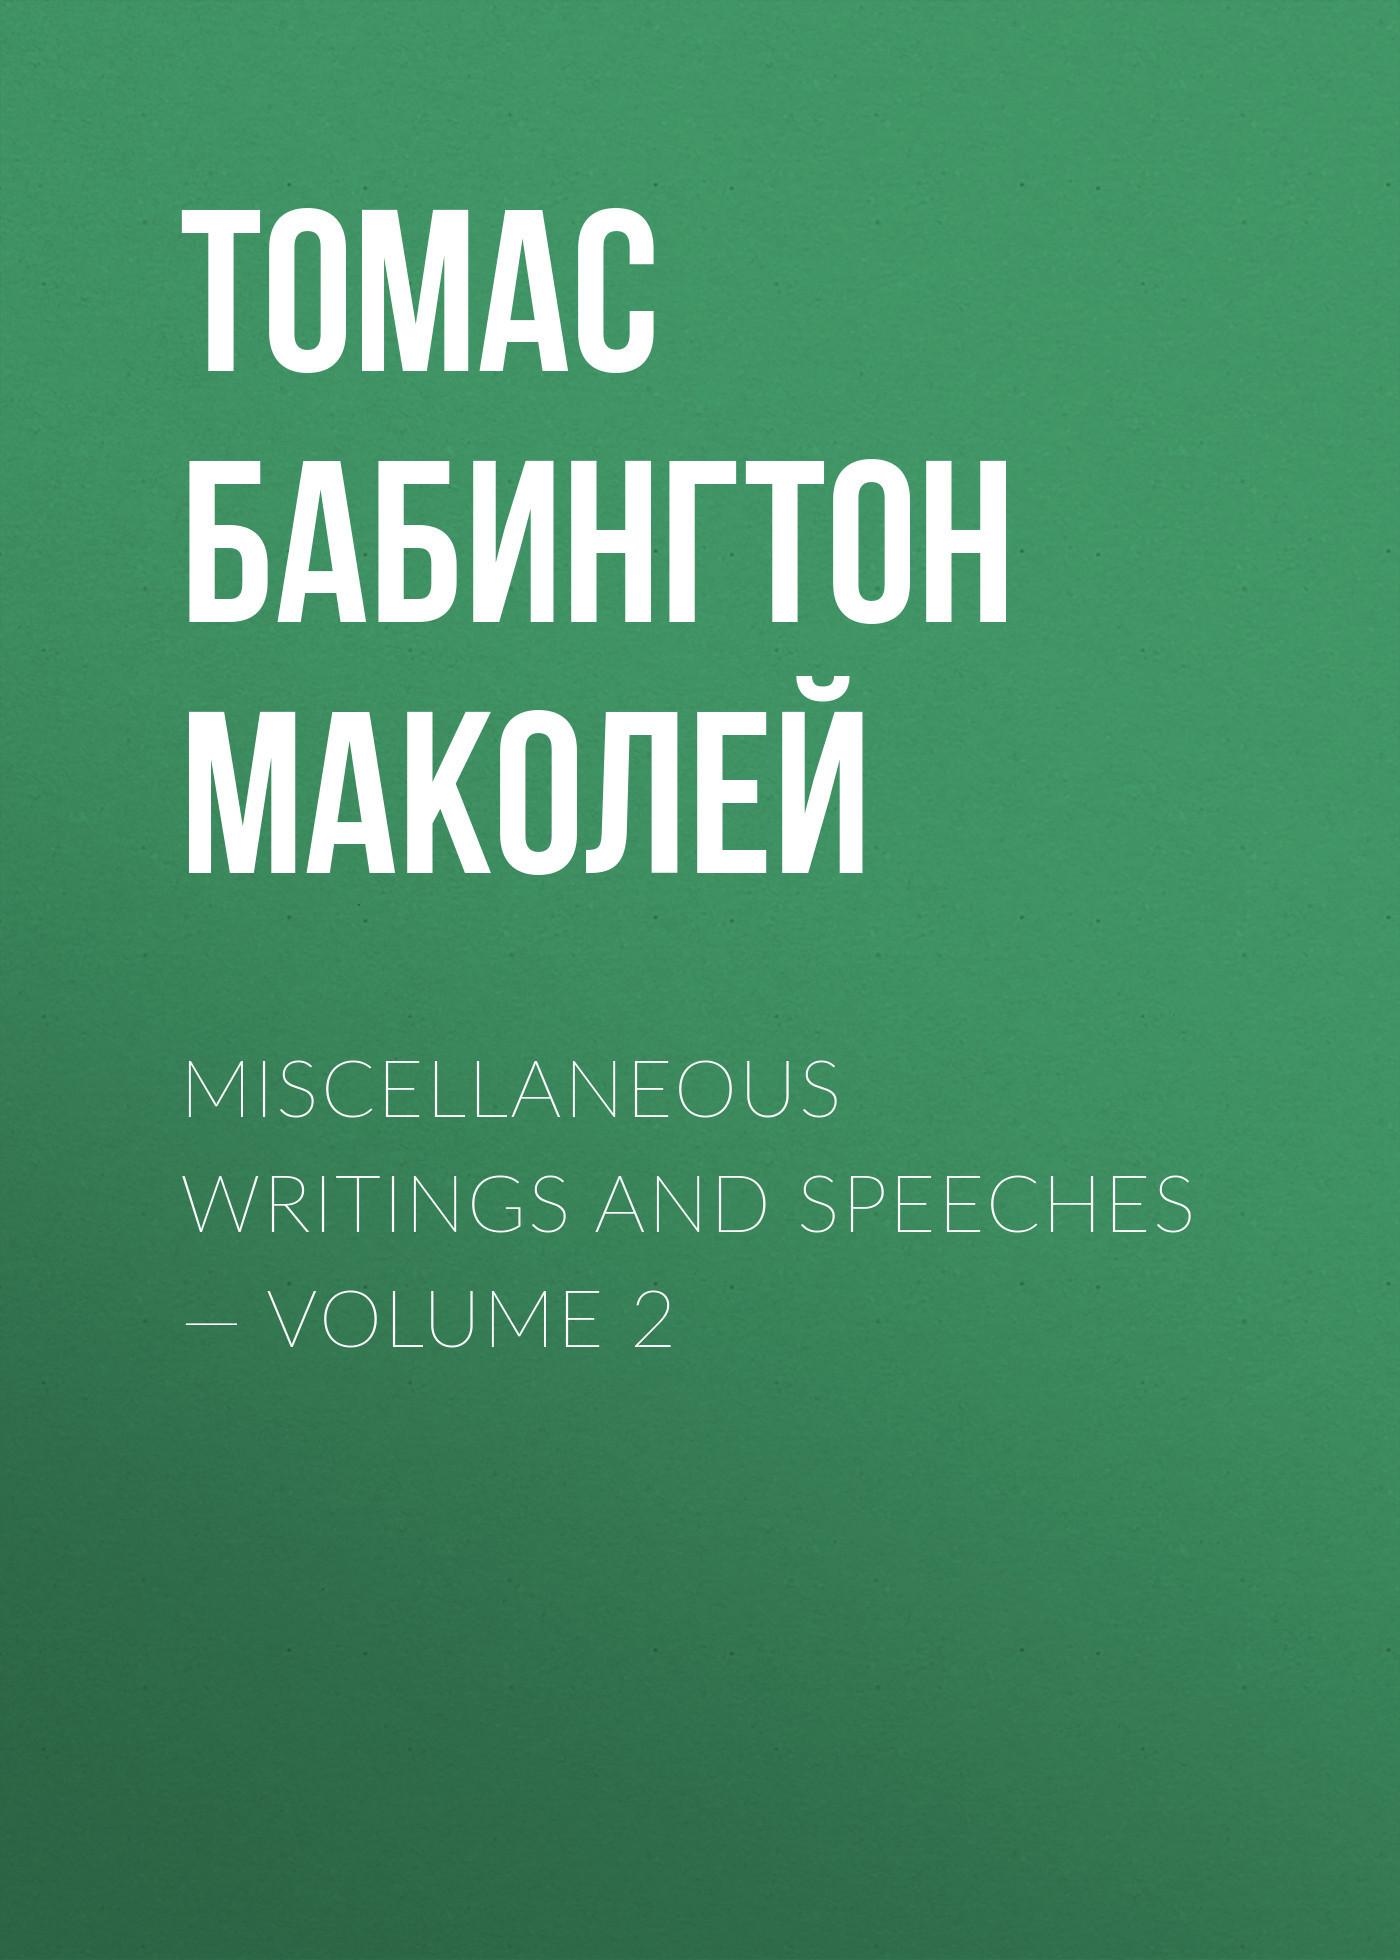 Томас Бабингтон Маколей Miscellaneous Writings and Speeches — Volume 2 томас бабингтон маколей полное собрание сочинений том 2